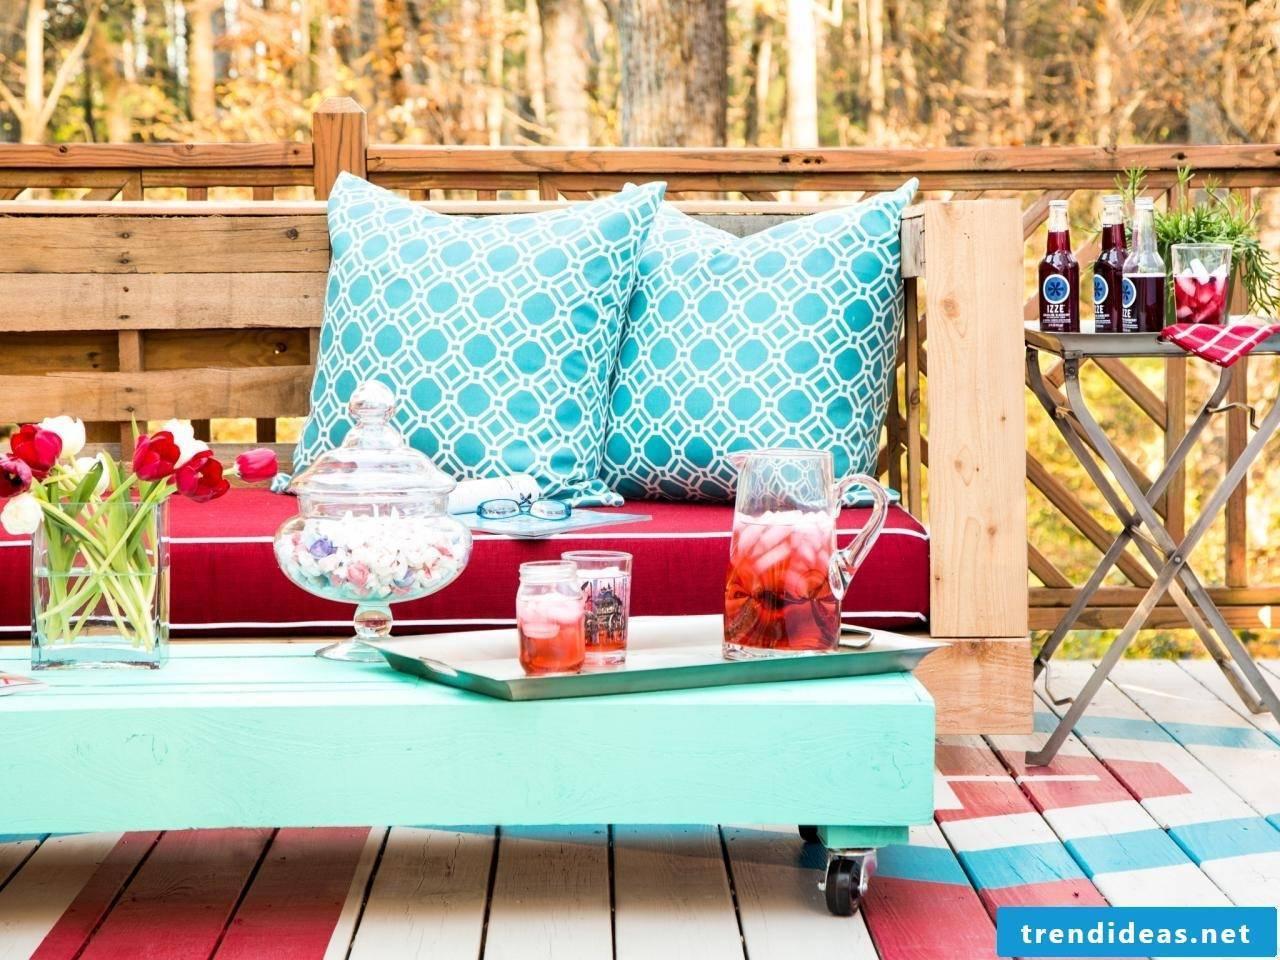 Chill corner for the simmer days